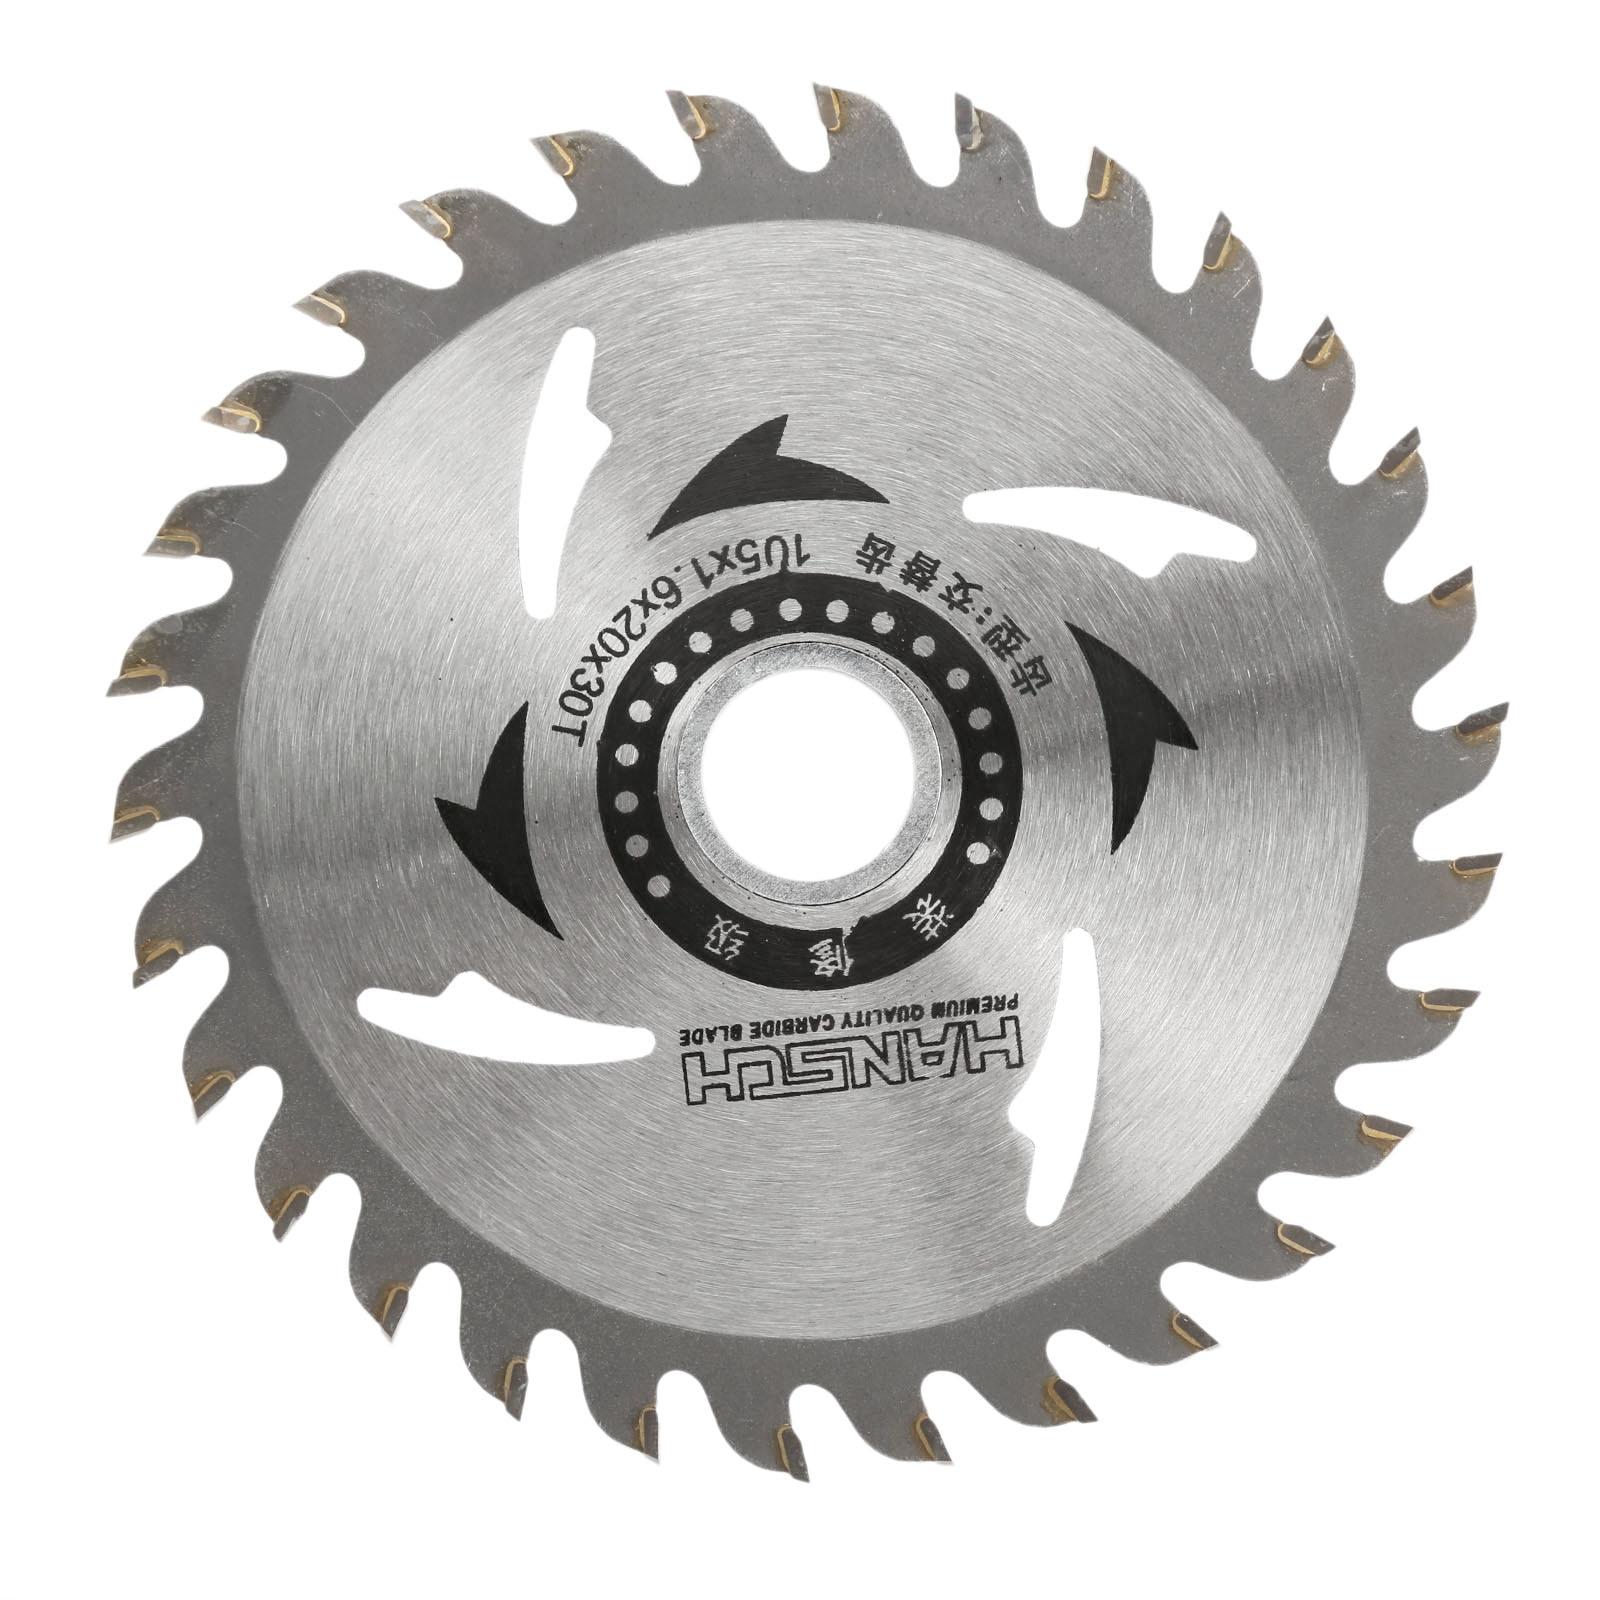 1Pc 30 Teeth Circular Saw Blade Wheel Cutting Discs Tungsten Steel Circular Wood Blade For Granite Power Tool Dremel Accesories